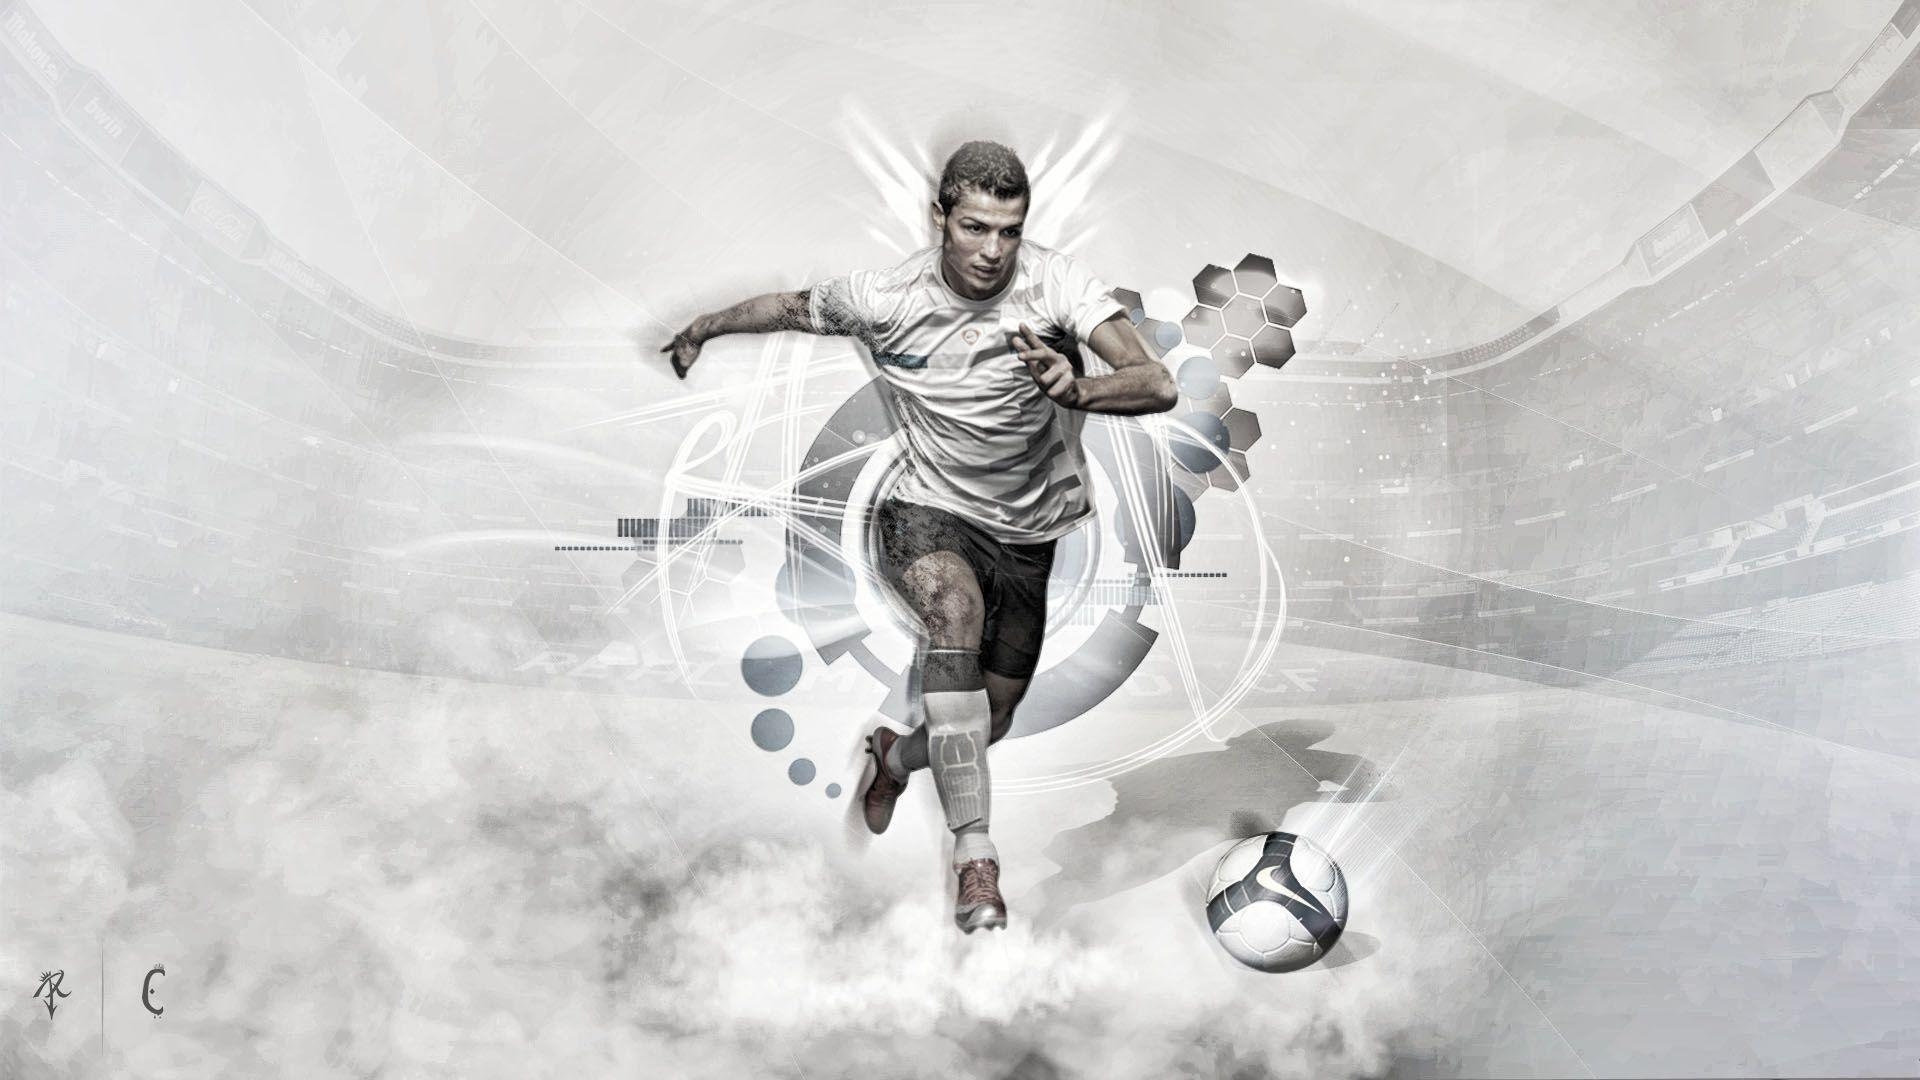 Football Cristiano Ronaldo Hd Wallpapers: Cristiano Ronaldo Wallpapers 2015 HD